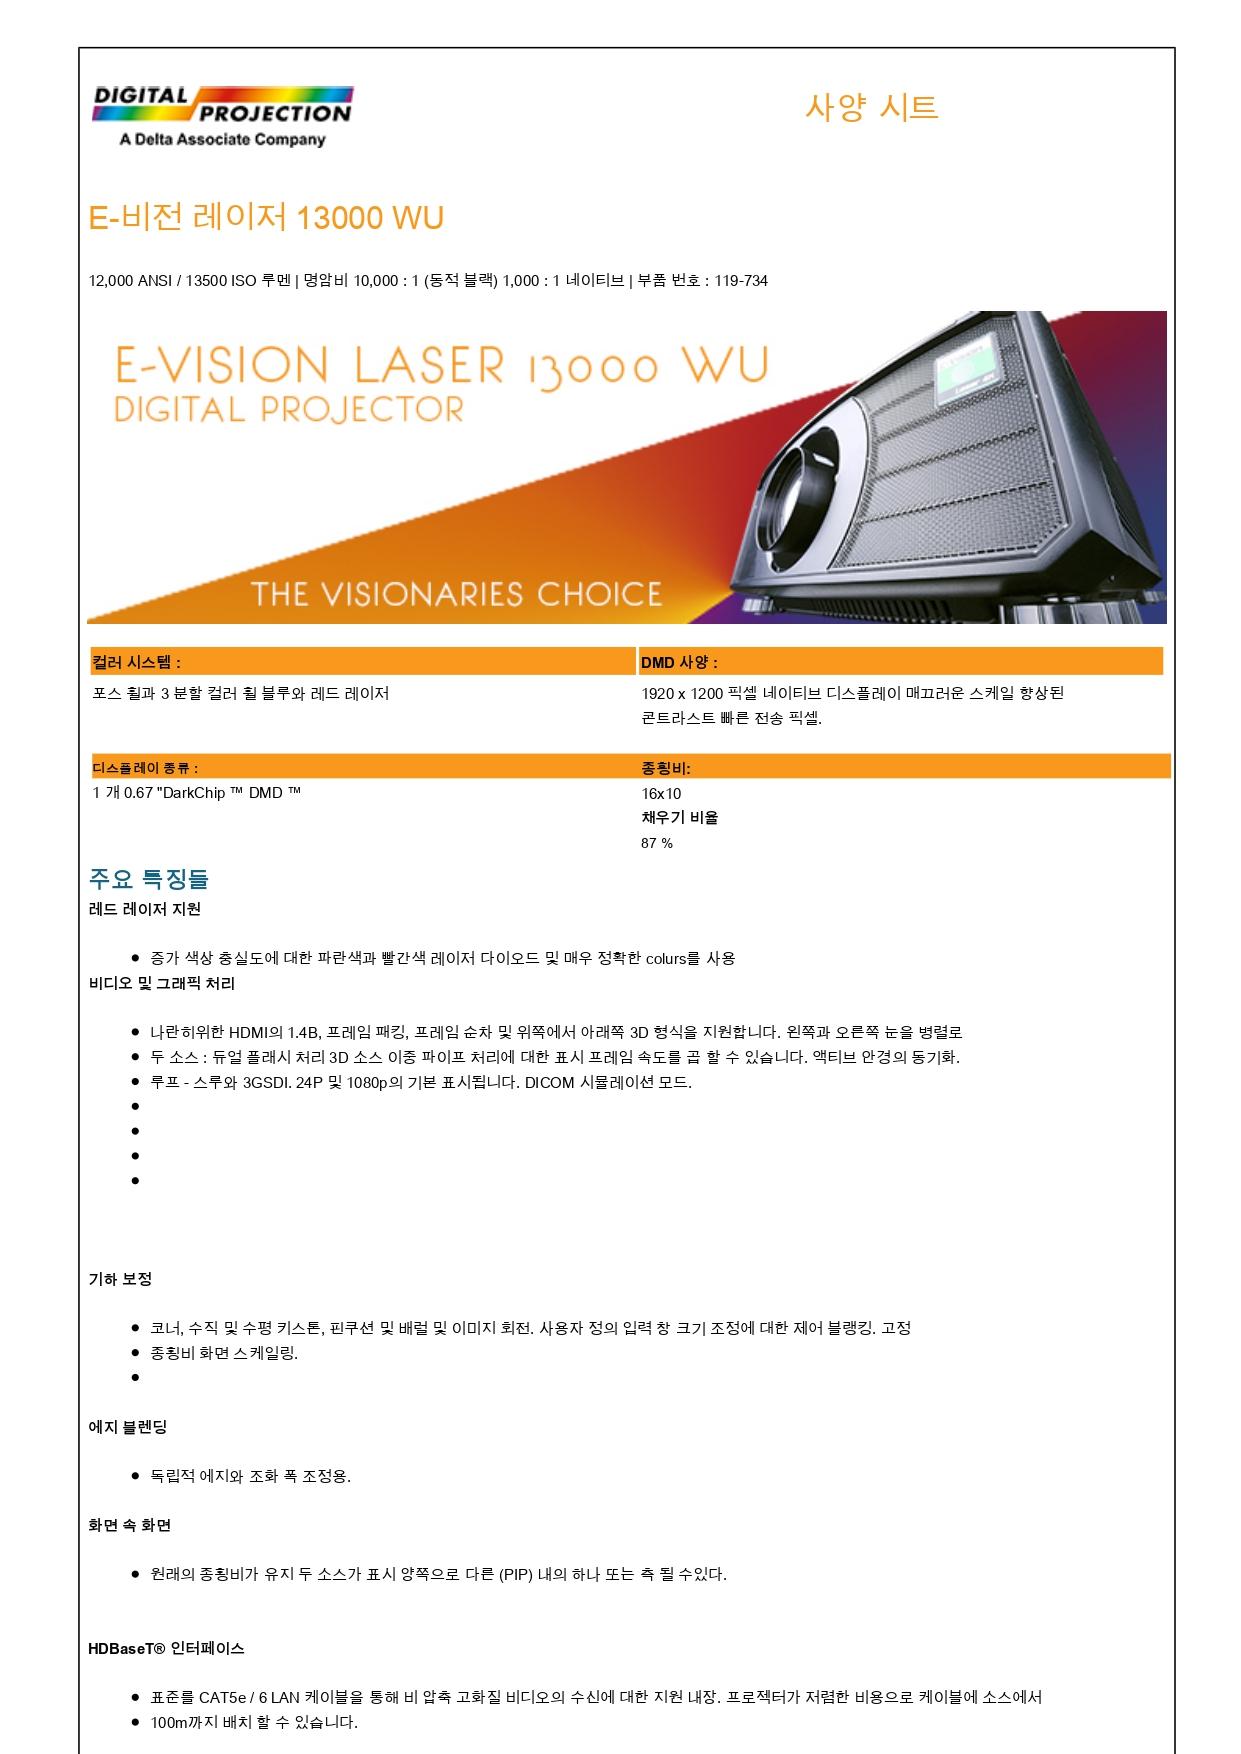 digitalprojection-119-734.en.ko_page-0001.jpg